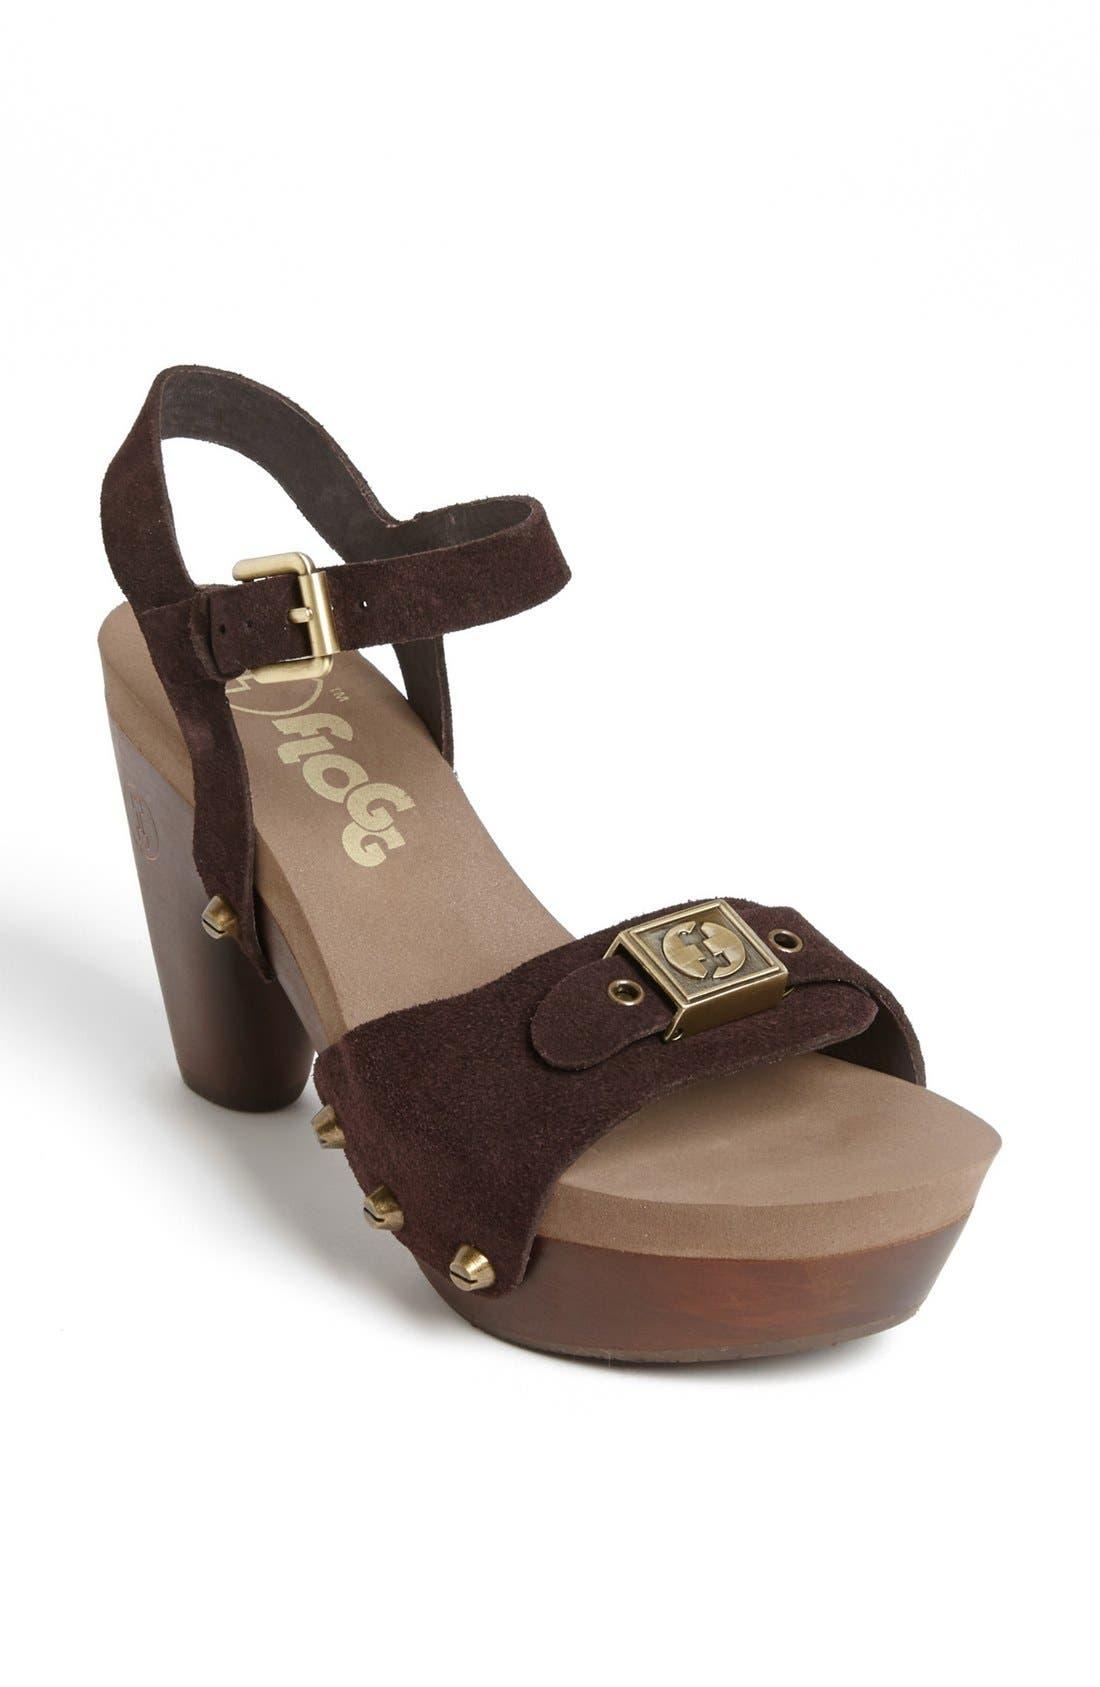 Main Image - Flogg 'Fantastic' Sandal